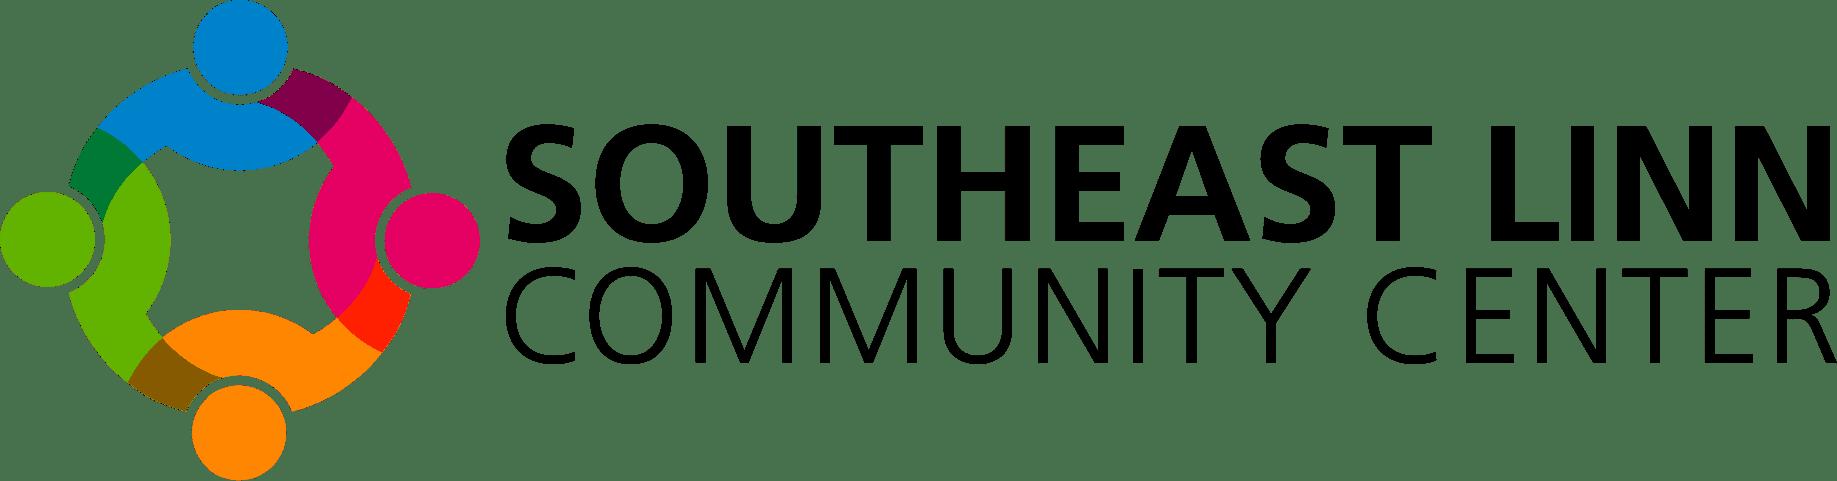 Southeast Linn Community Center